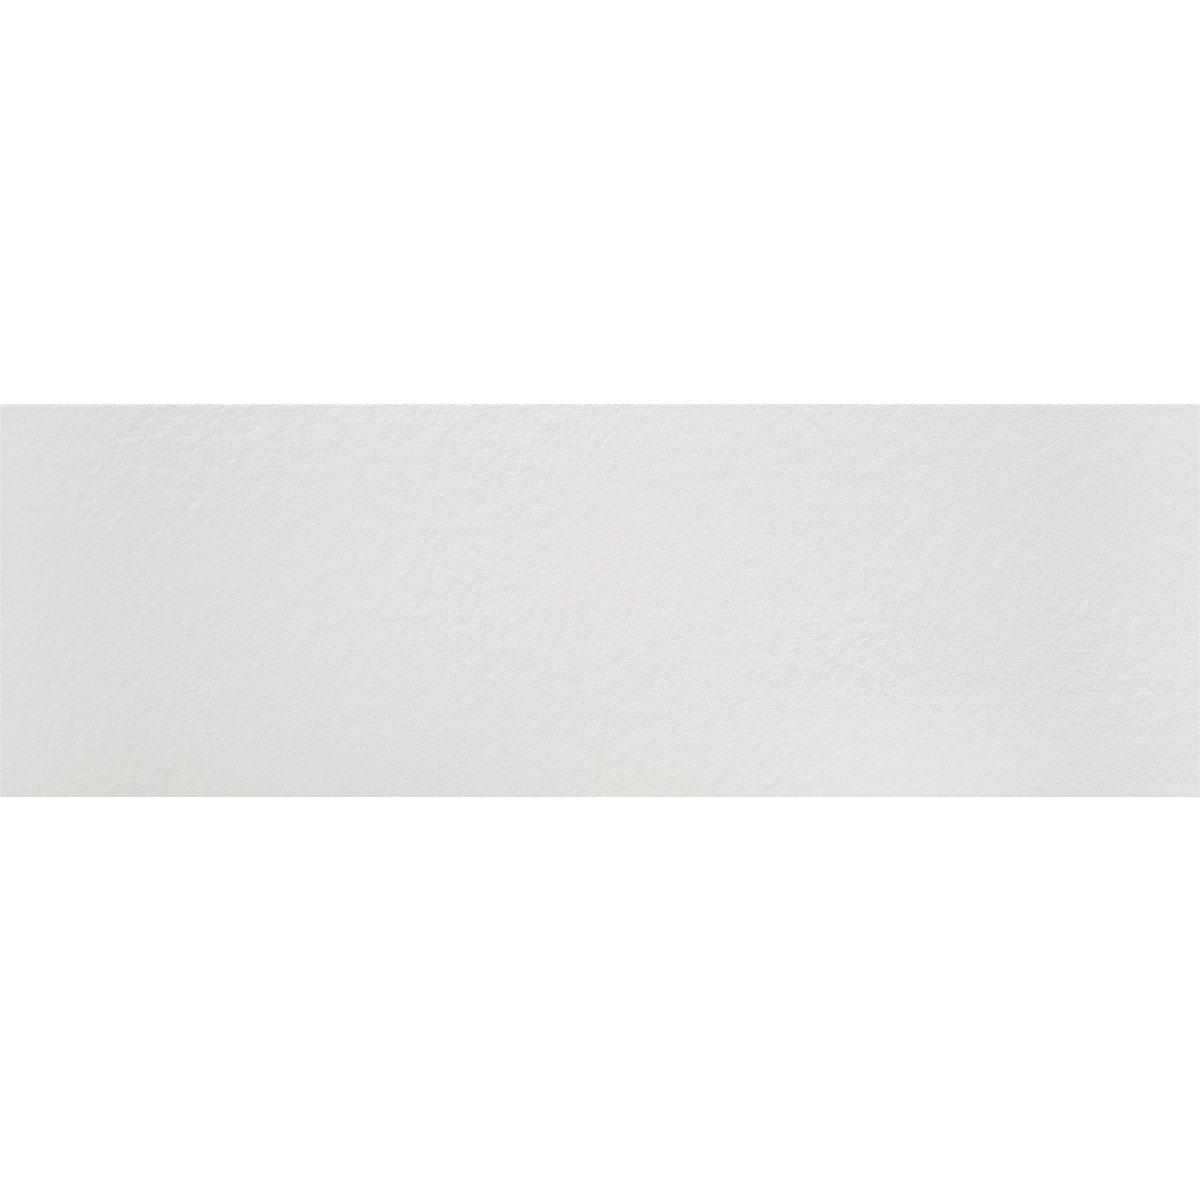 Arty - White - Patterned Tiles - Stone3 Brisbane